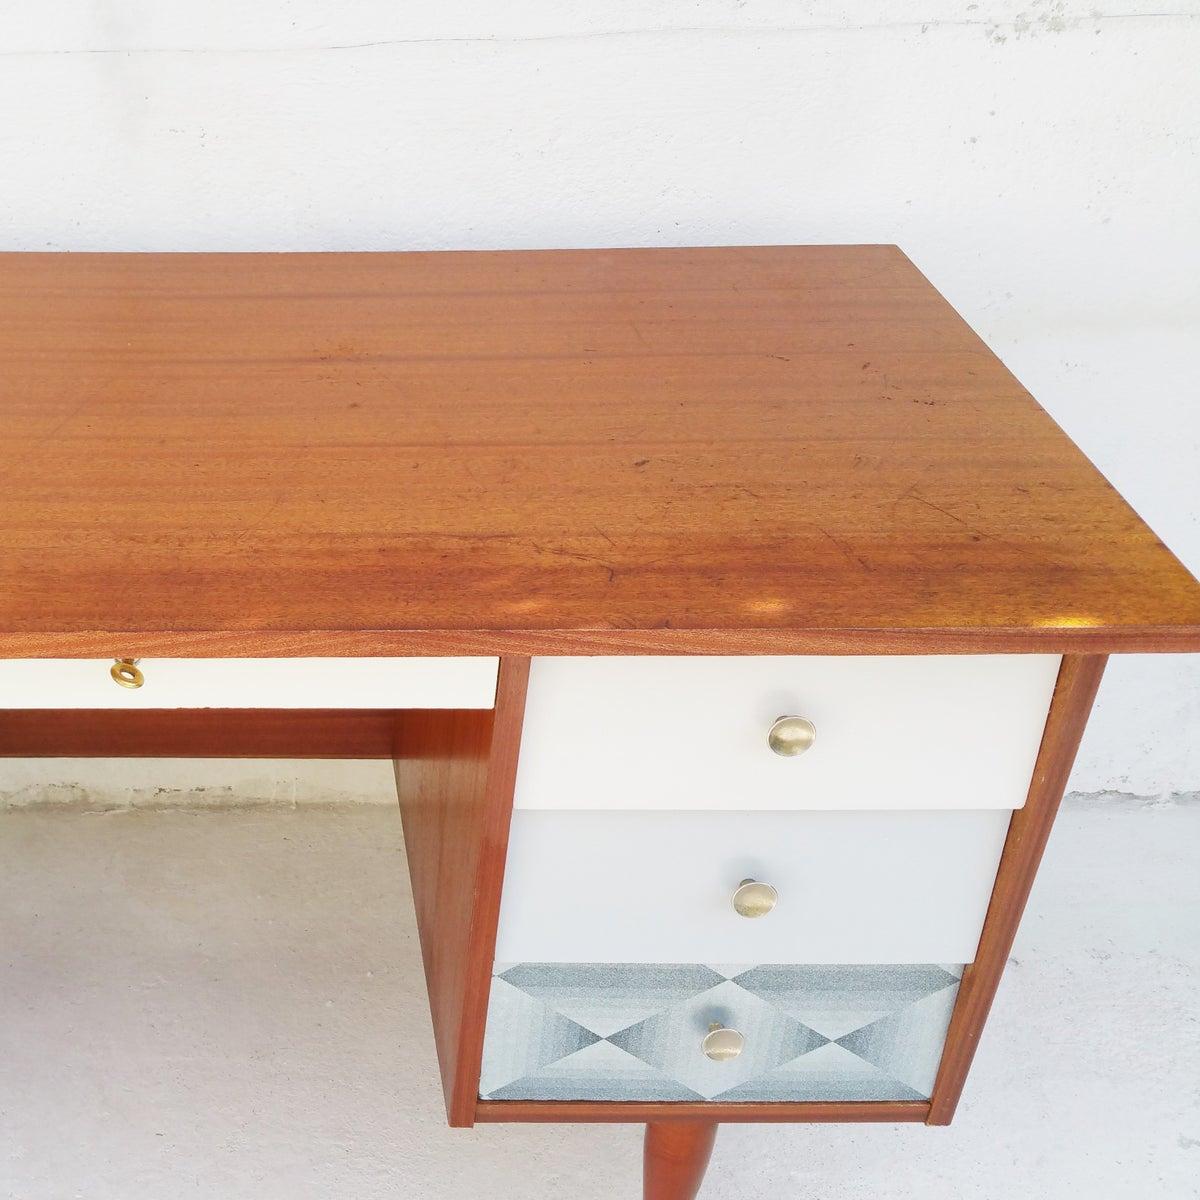 bureau customis style scandinave fibresendeco vannerie artisanale mobilier vintage. Black Bedroom Furniture Sets. Home Design Ideas